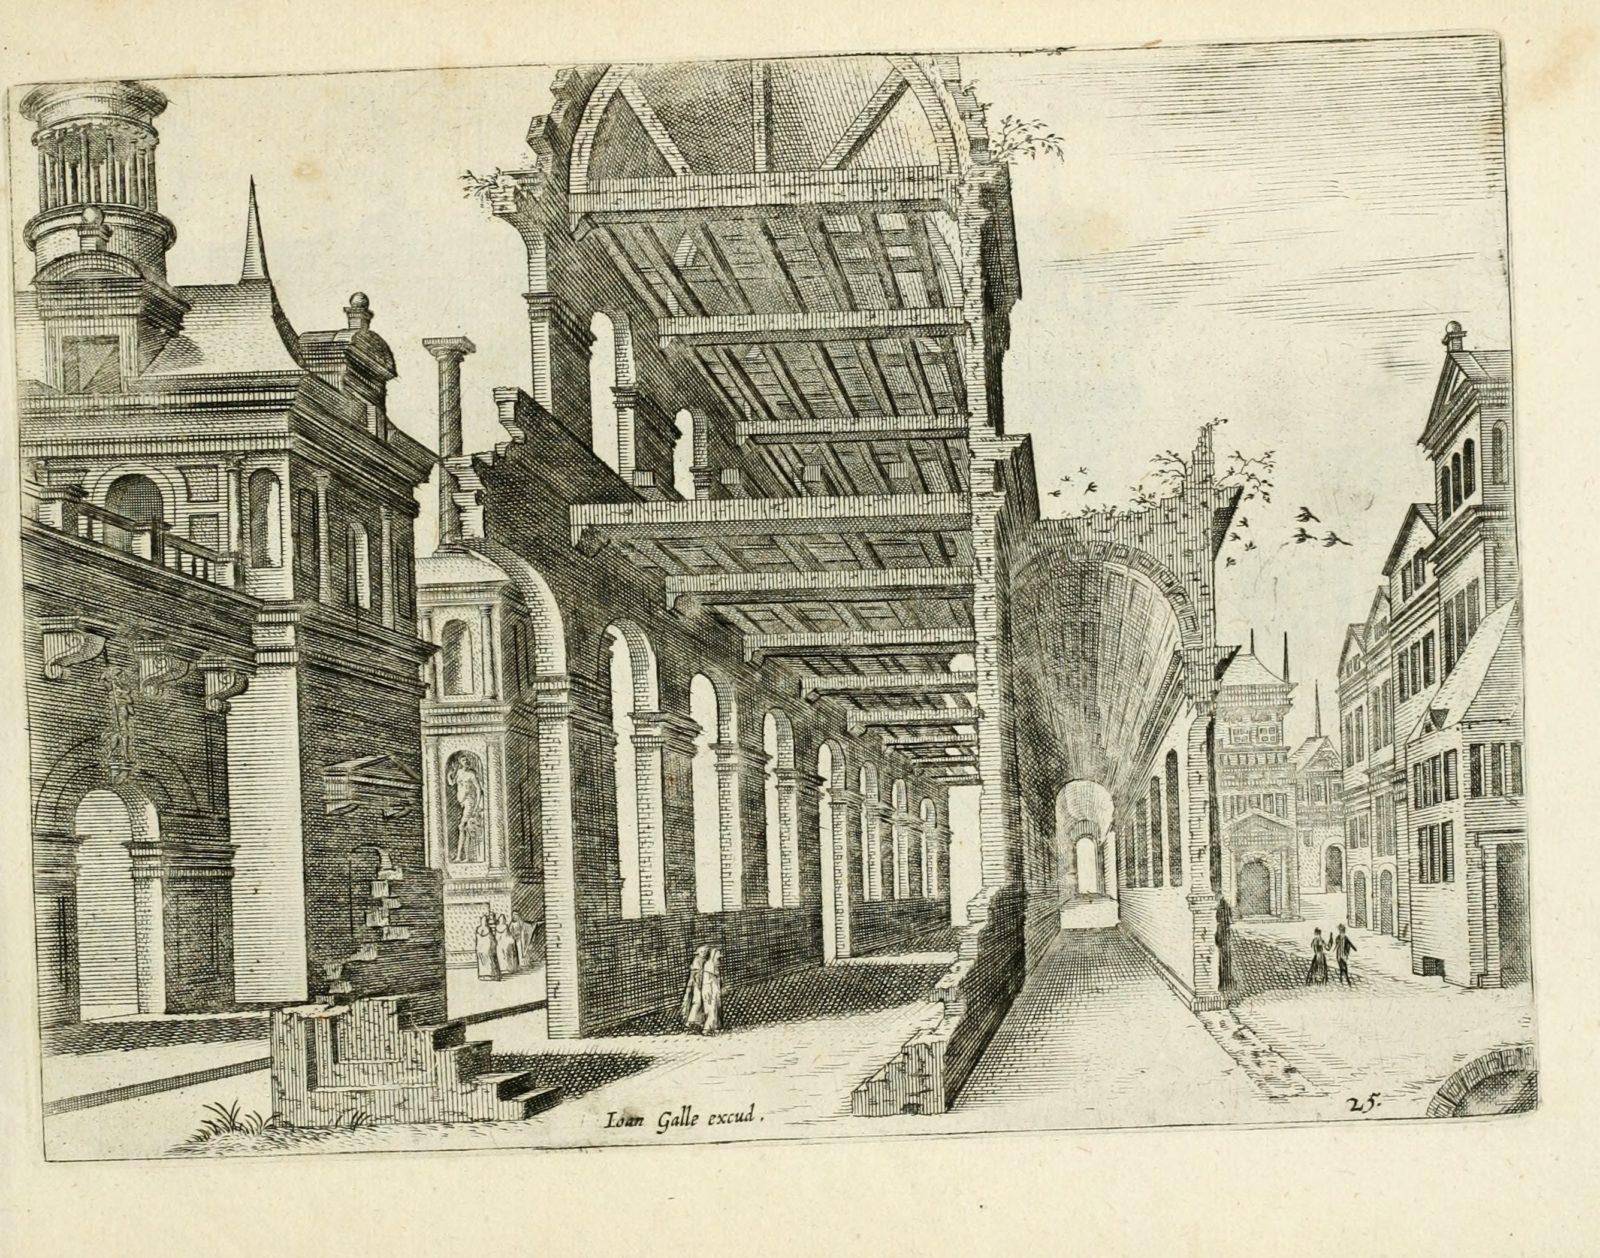 Variae architecturae formae by Vredeman de Vries, Hans, 1527-ca. 1604; Doetecam, Jan van; Doetechum, Lucas van, 16th century